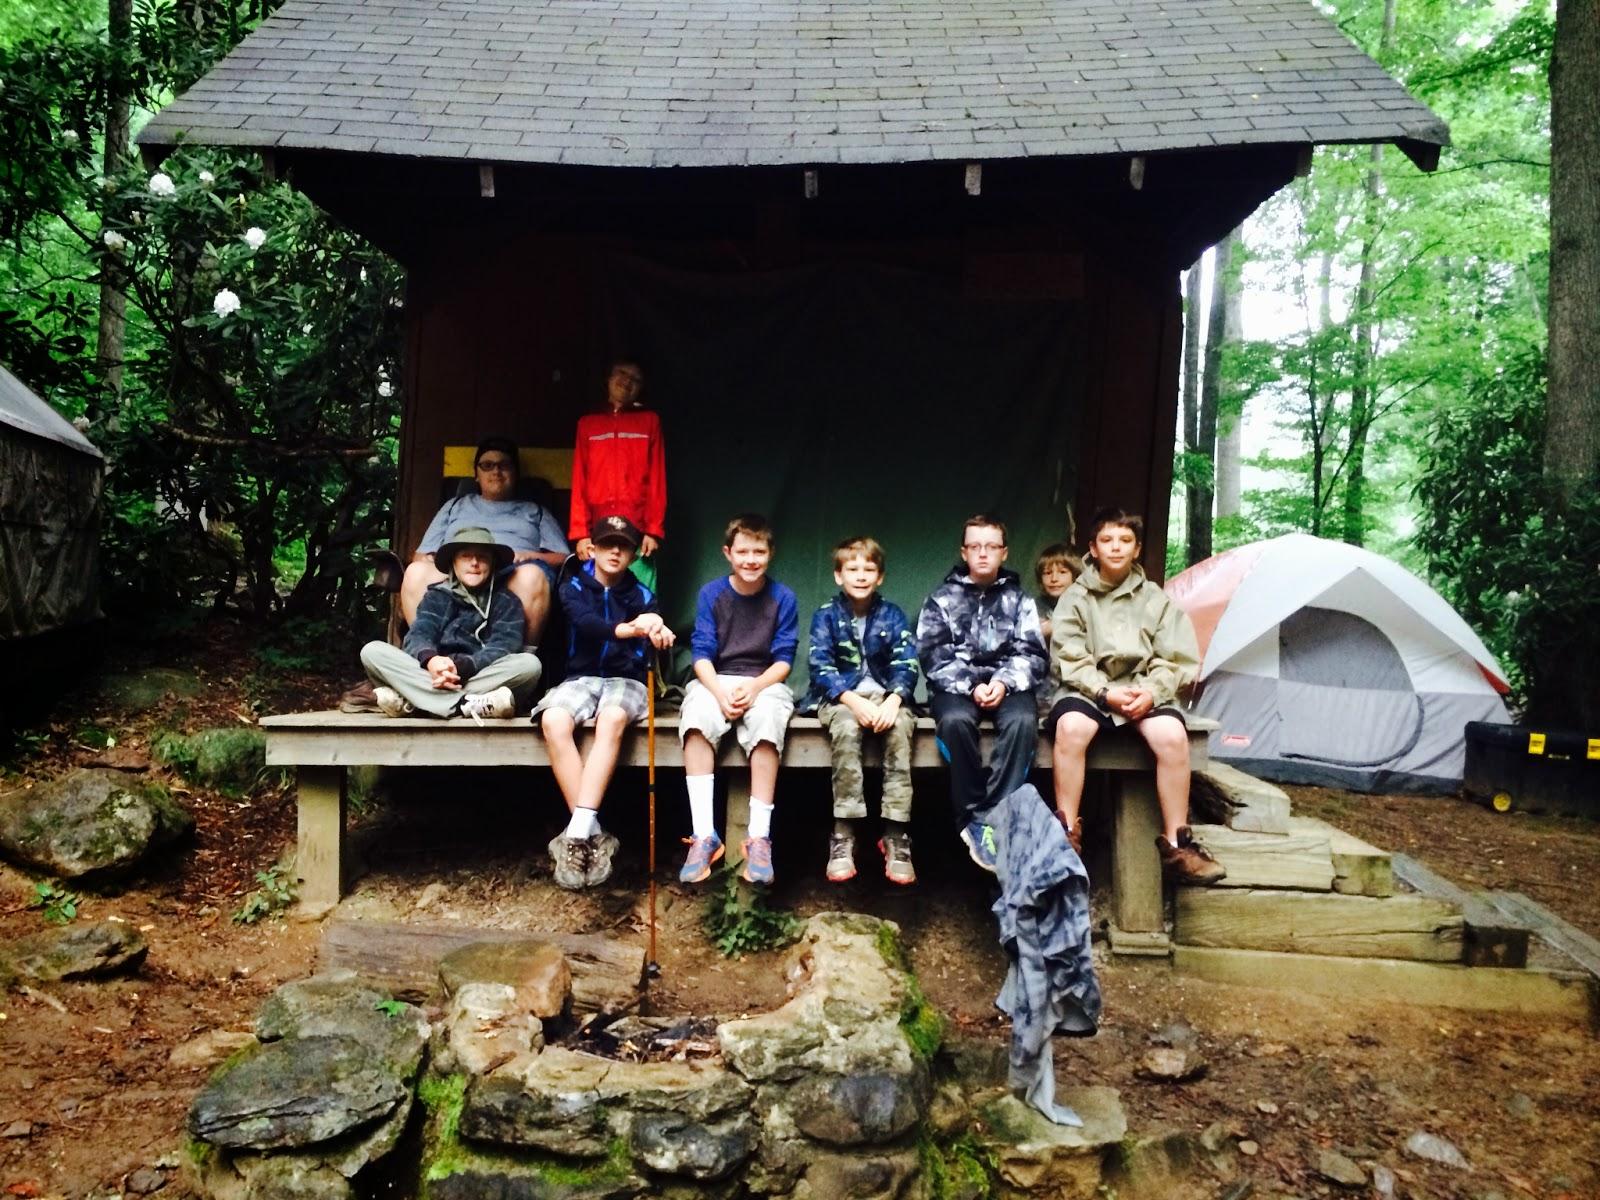 Family American Style 2016 One Week In Camp Daniel Boone NC